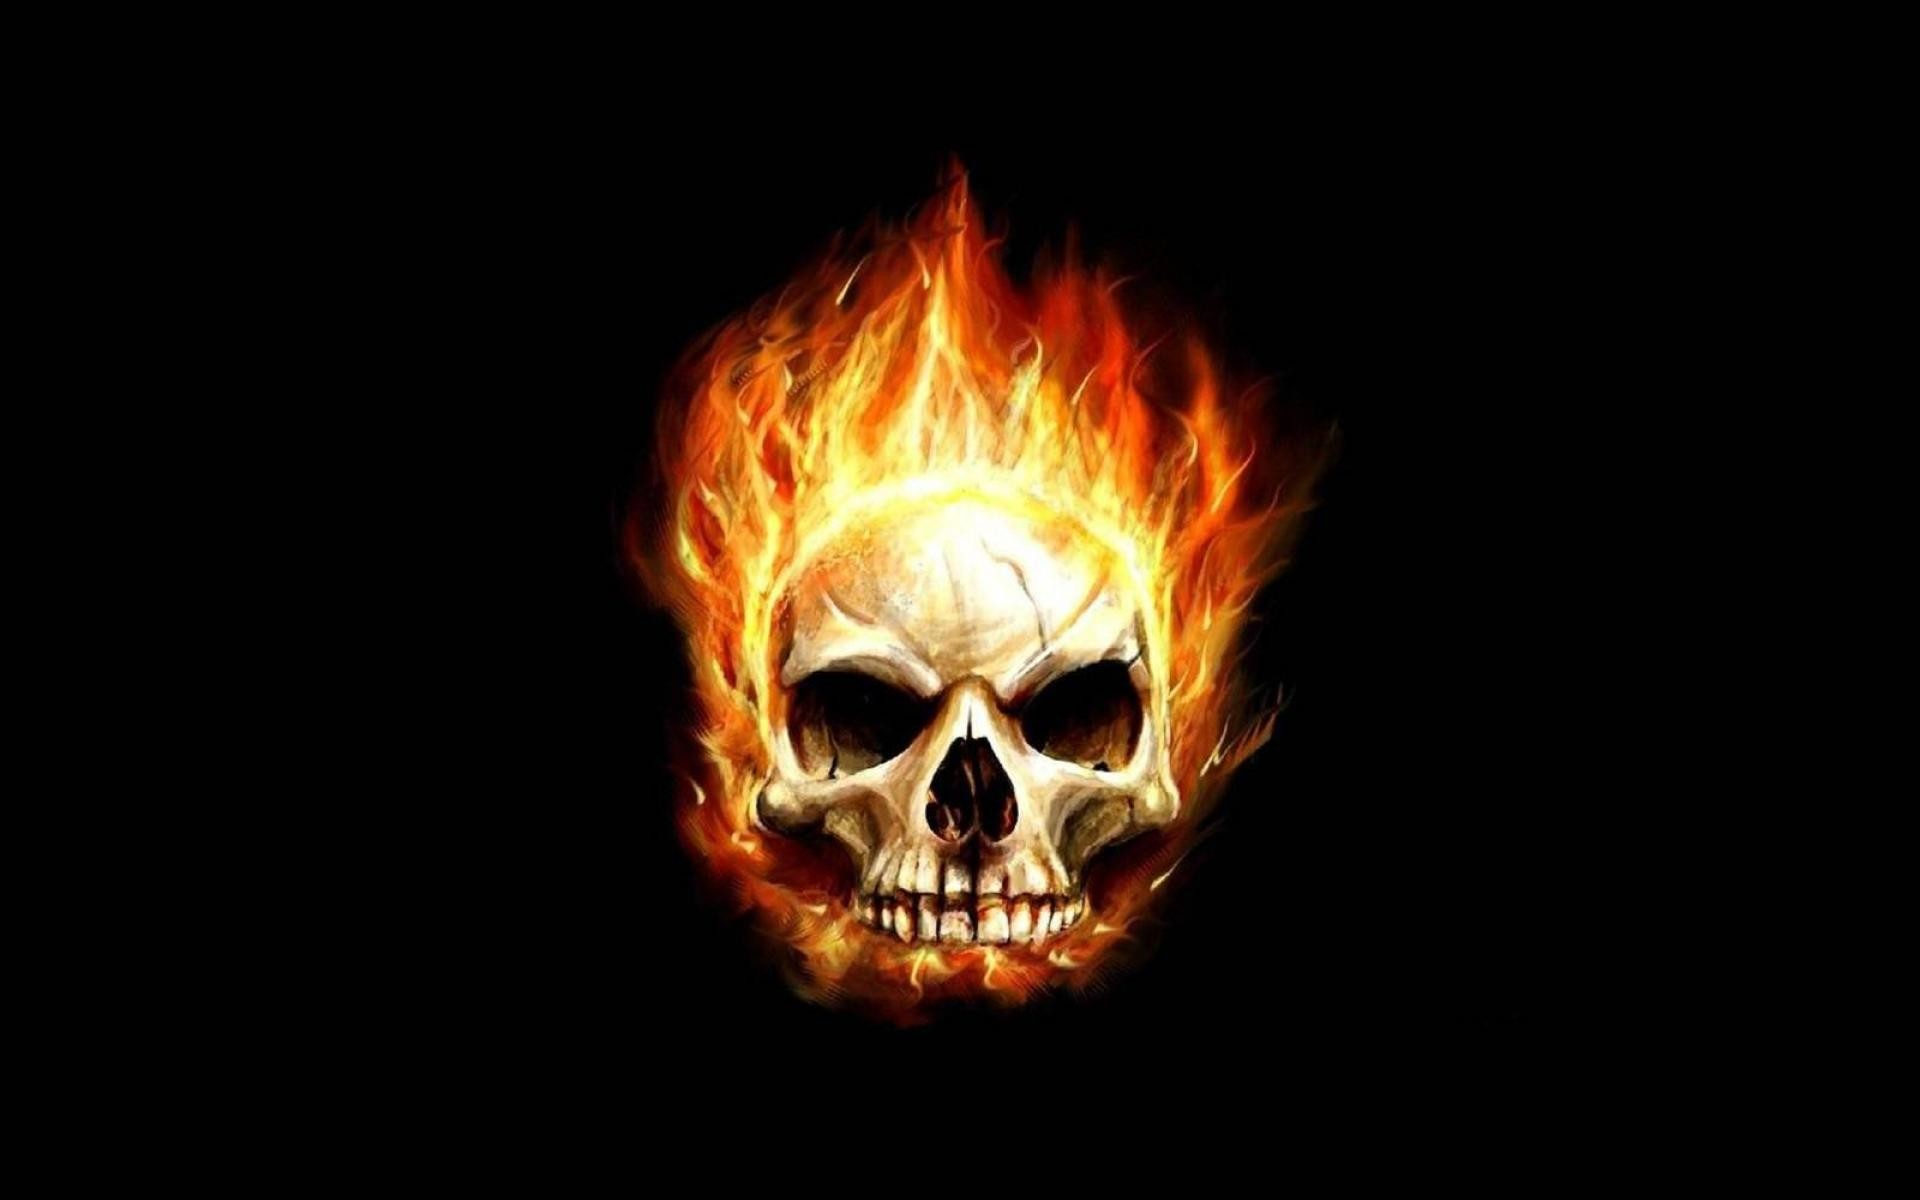 90k – jpg 1080 Skull Fire Fire Skull